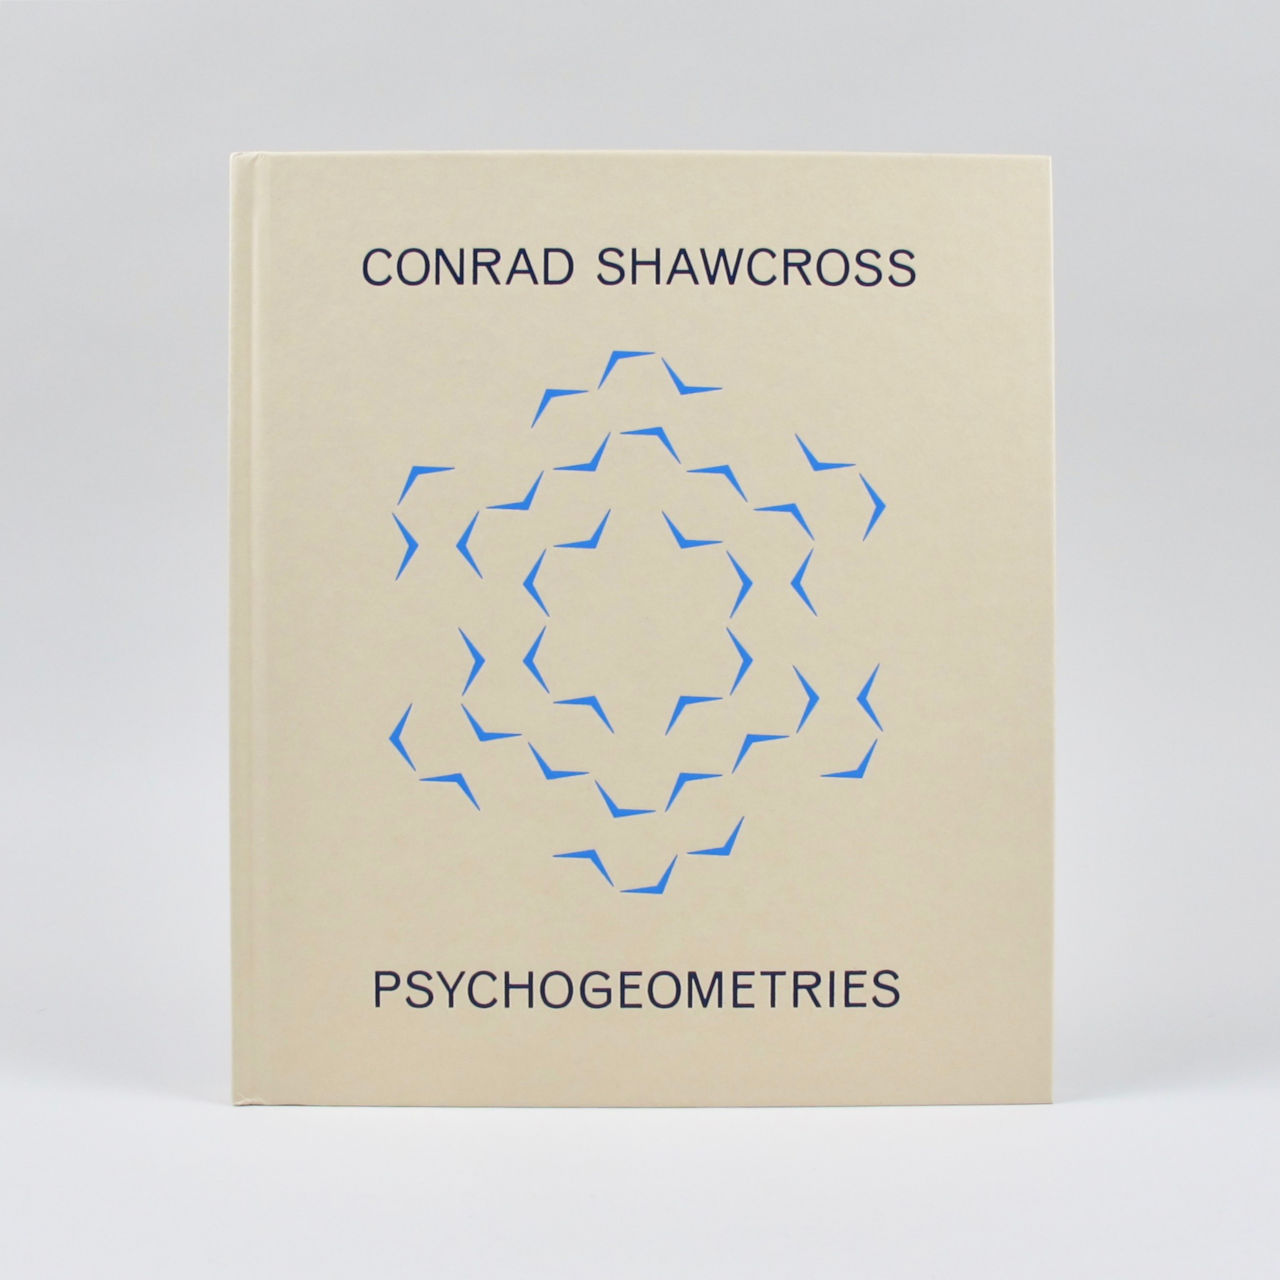 Psychogeometries - Conrad Shawcross